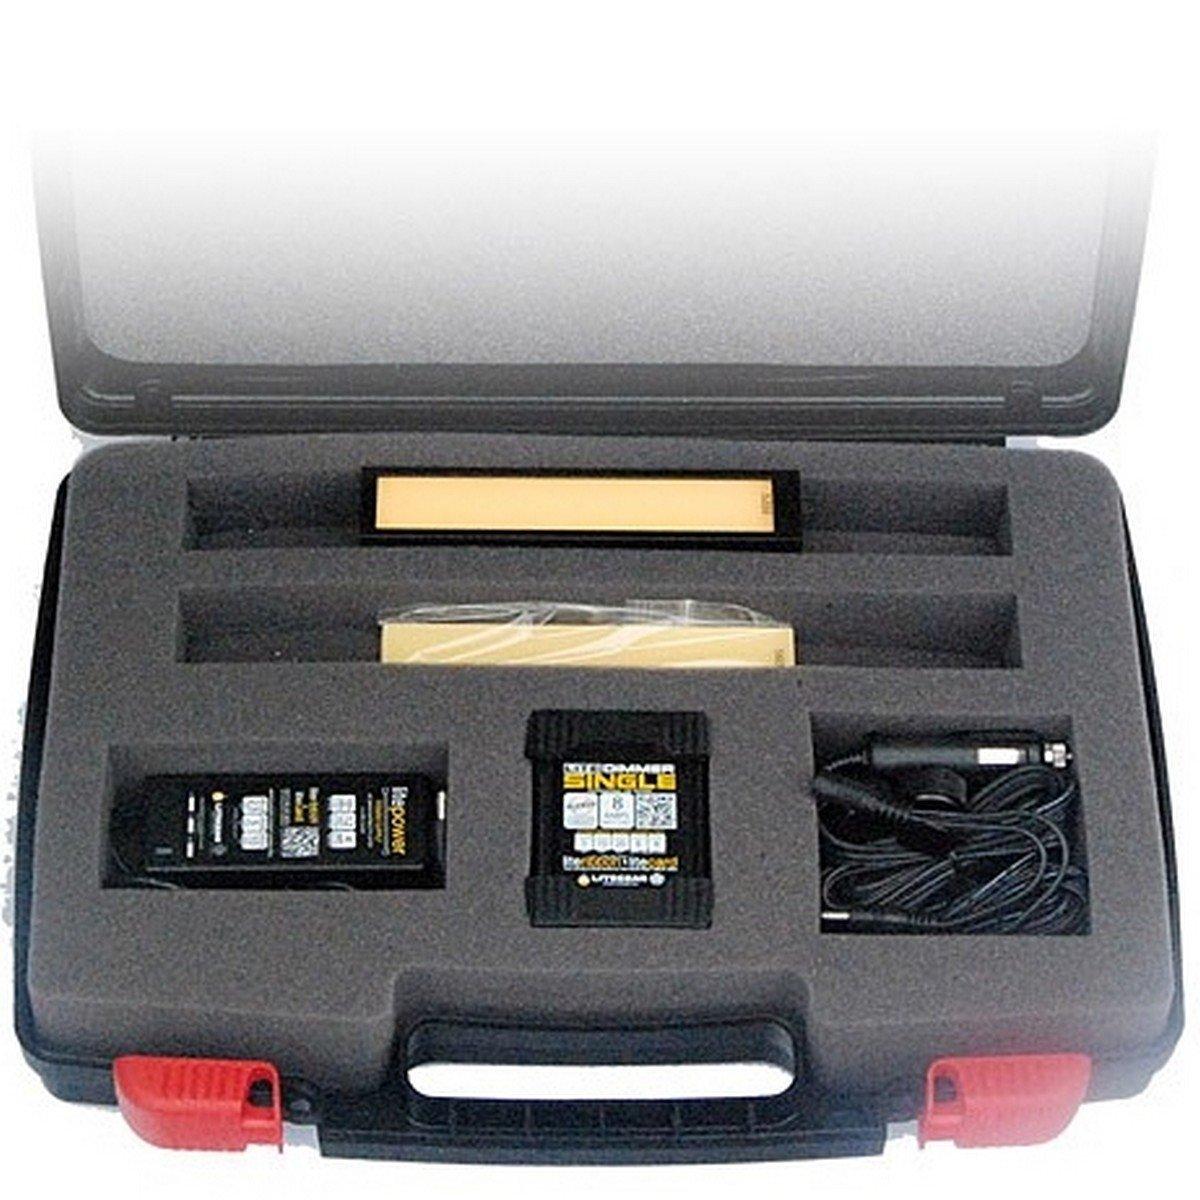 Cineo Lighting Matchstix Single Power Kit   Versatile Light Source 6inch 701.0106